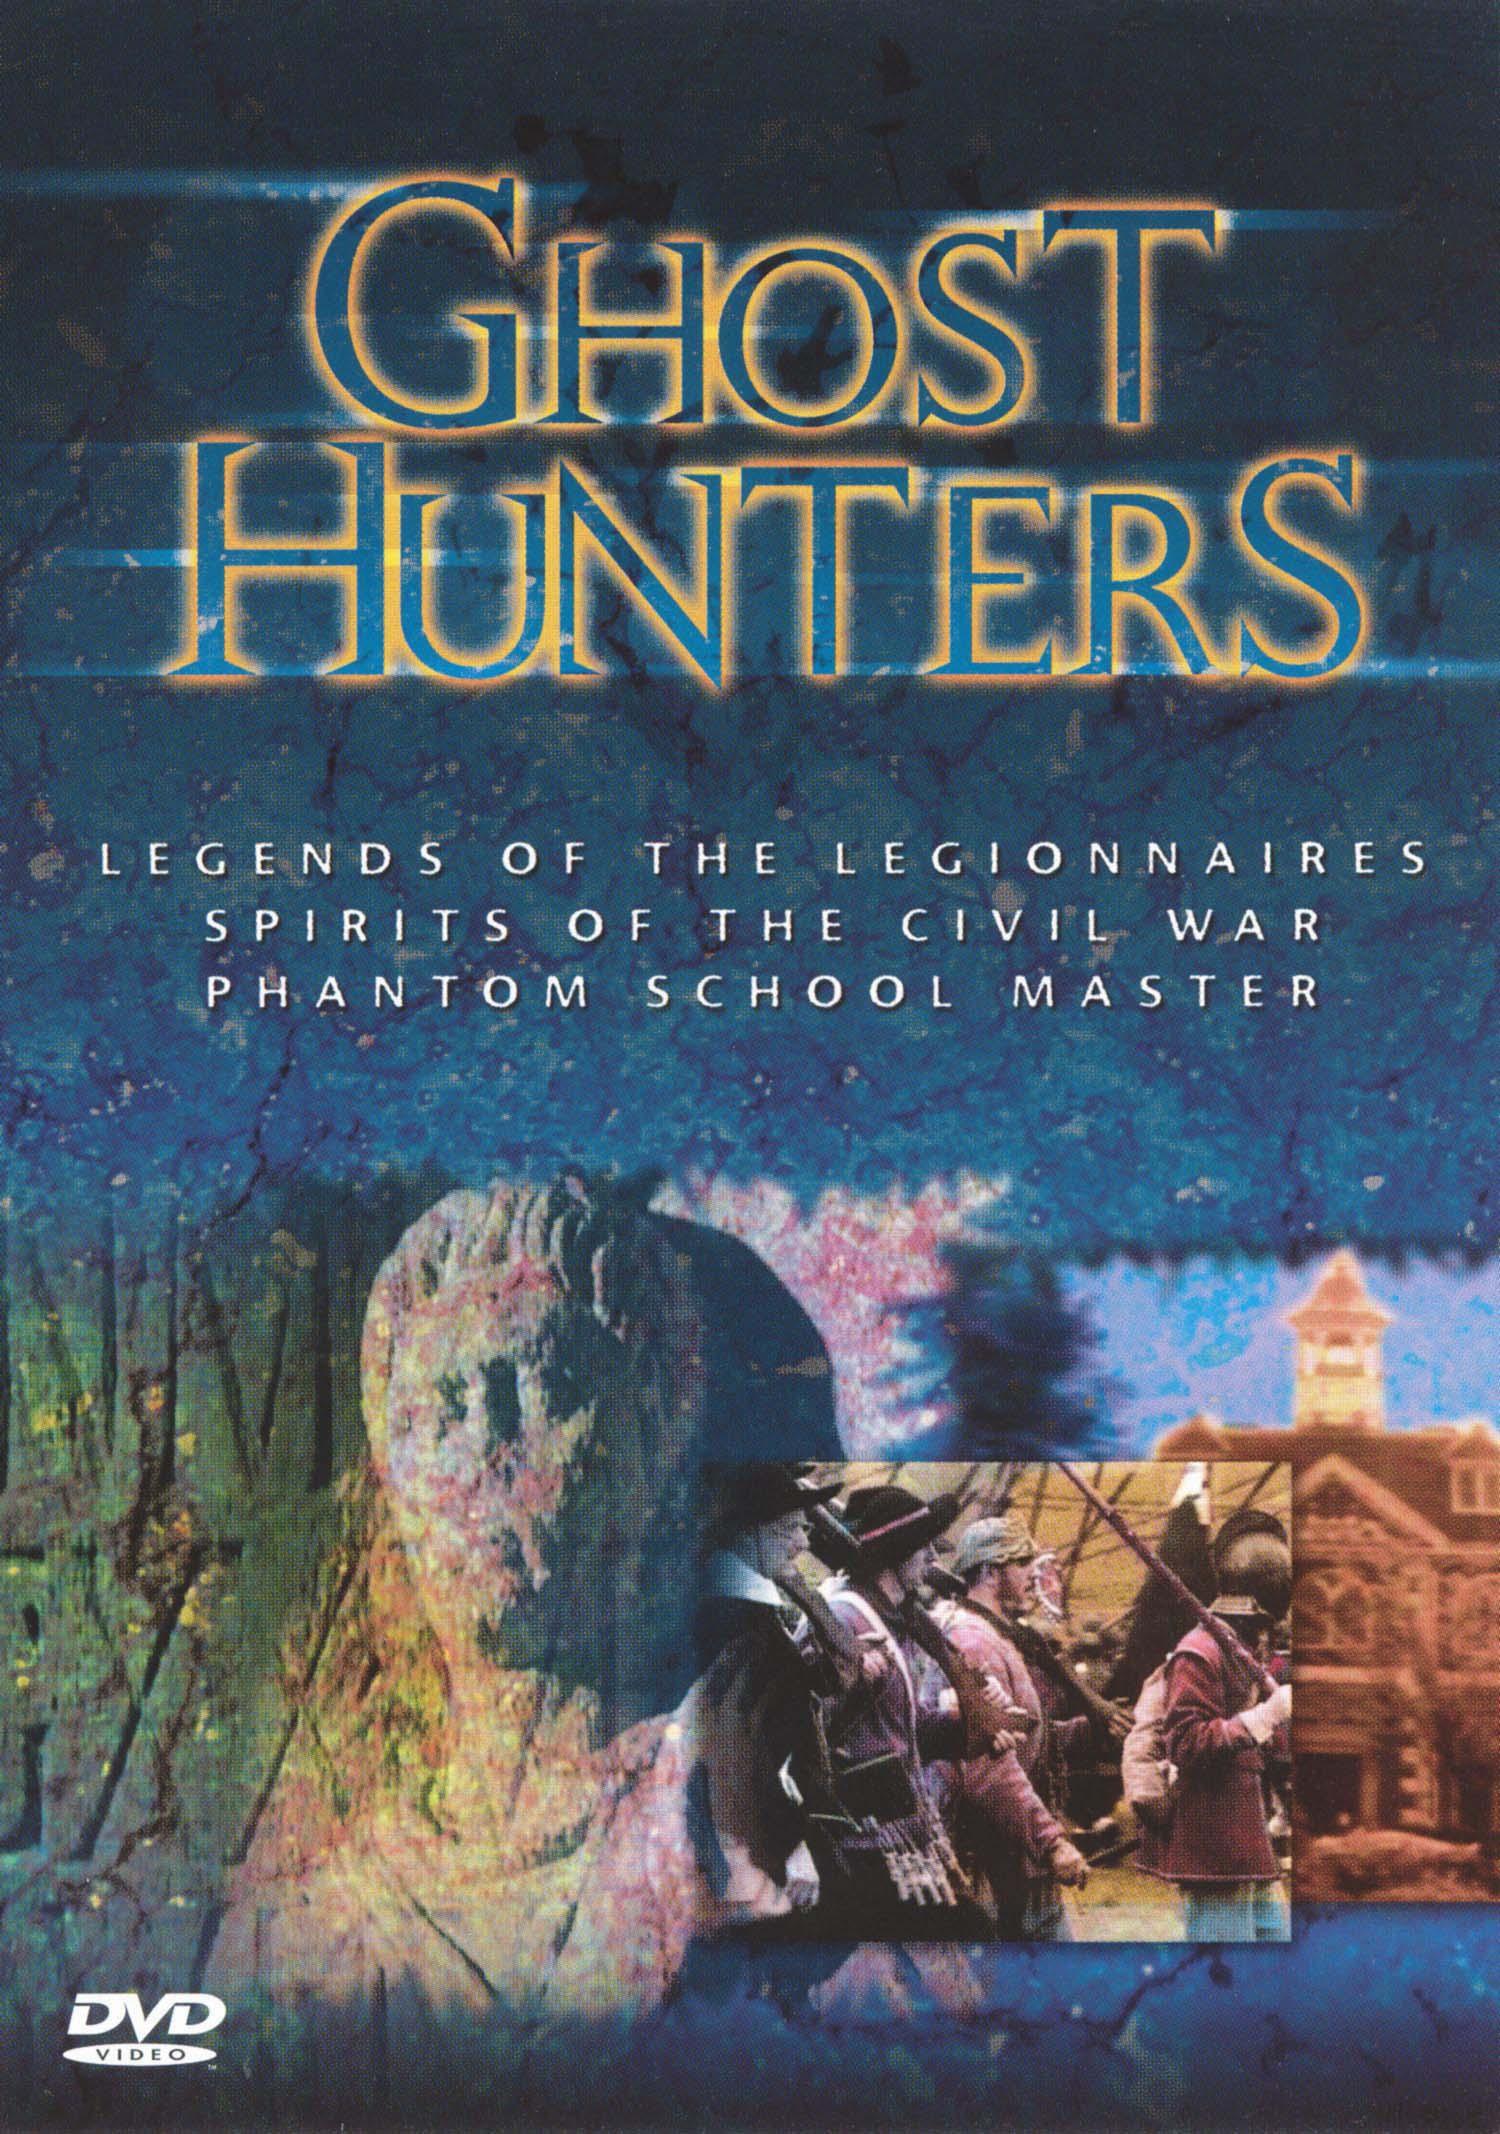 Ghost Hunters, Vol. 1